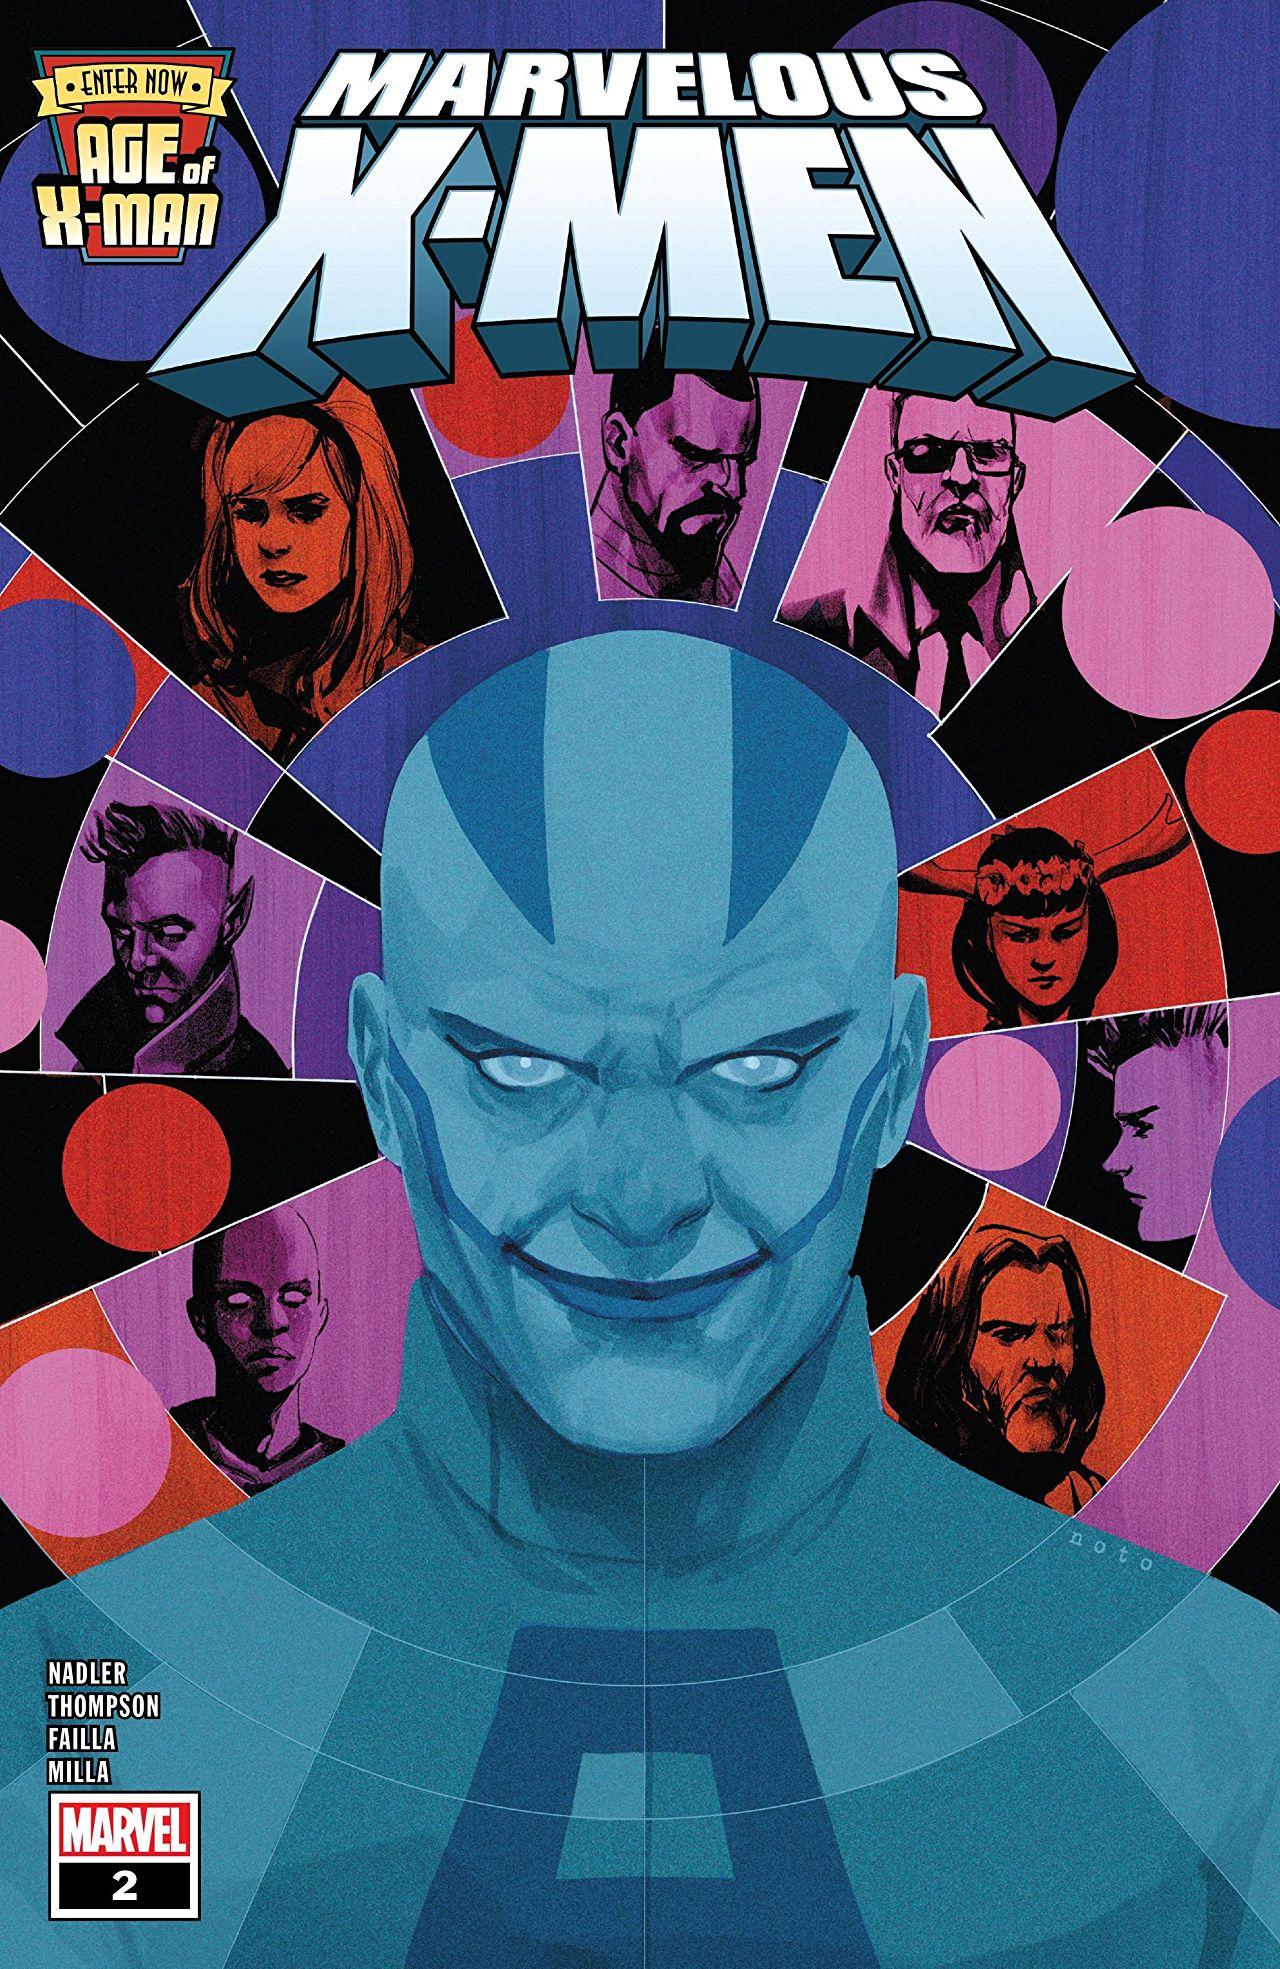 Age of X-Man: The Marvelous X-Men Vol 1 2